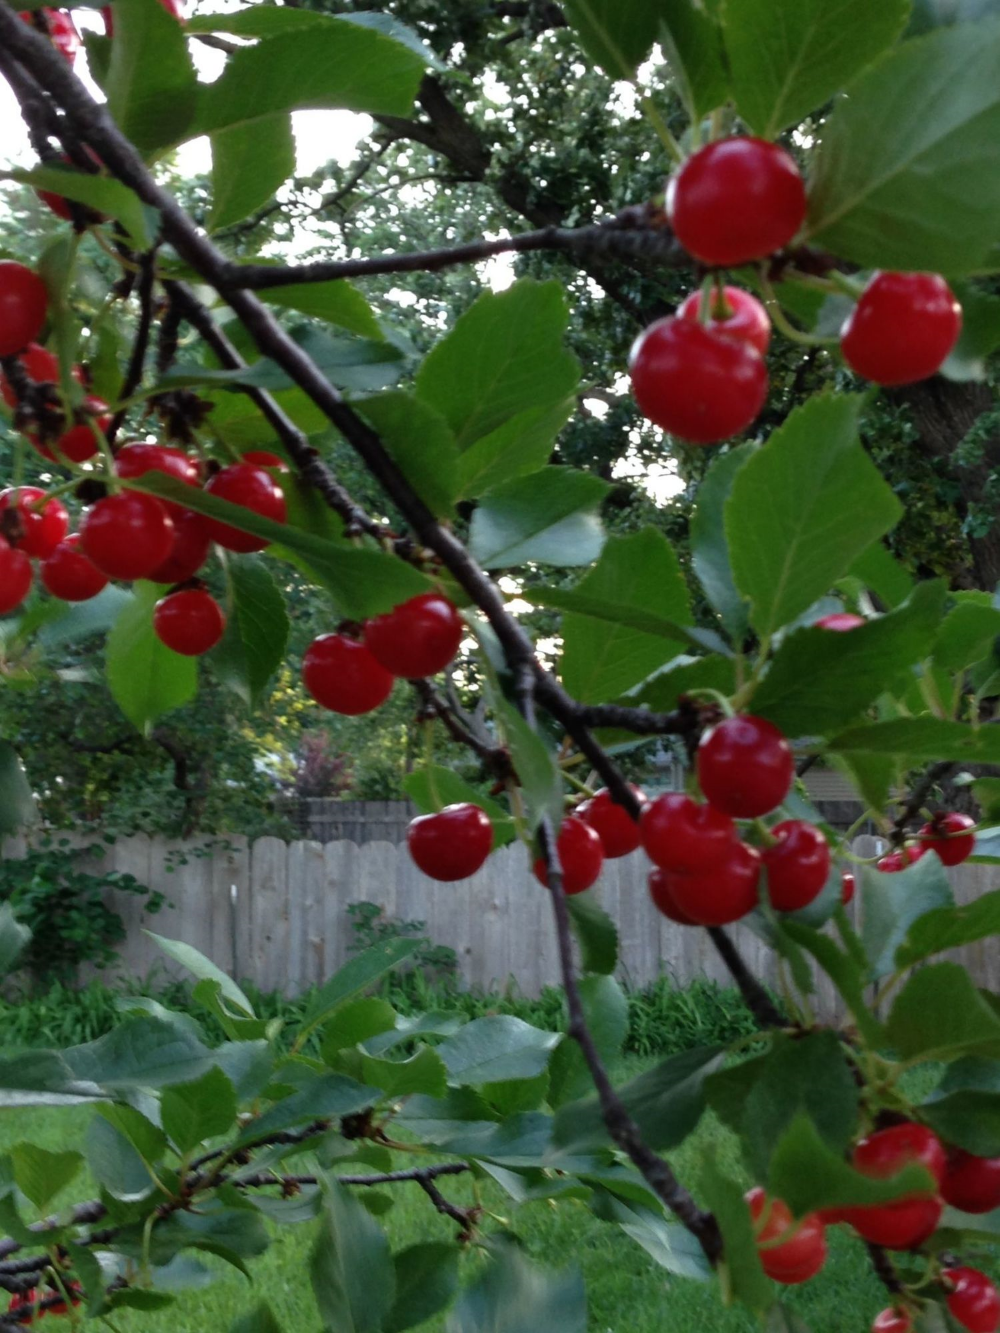 Cherries... ready for pickin'!